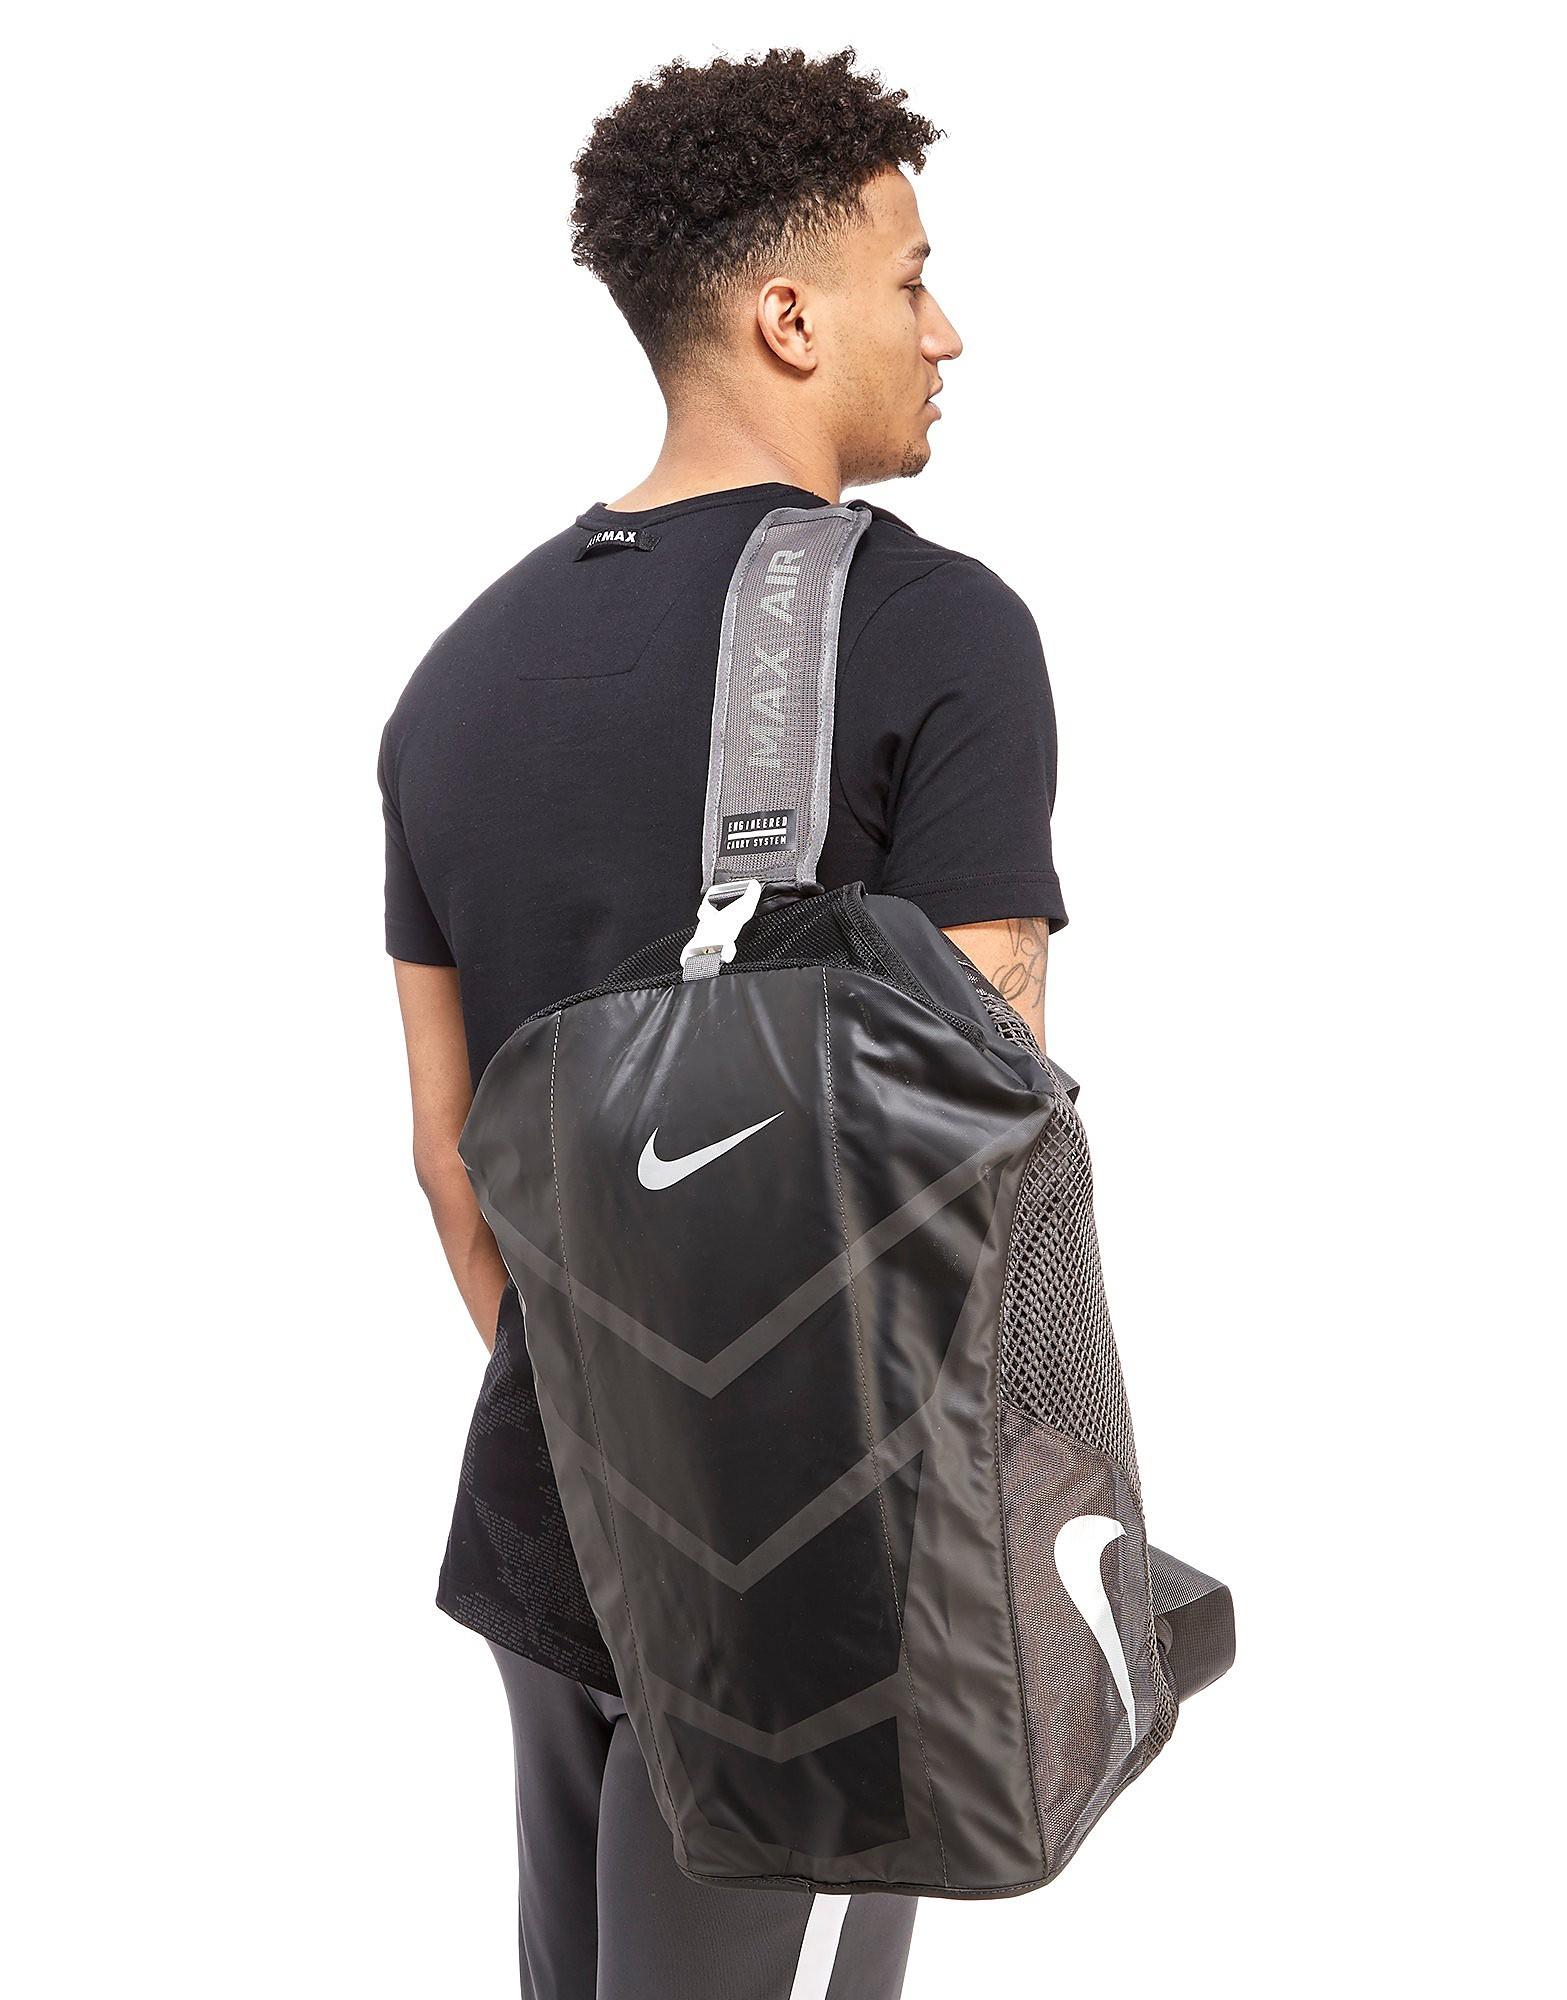 Nike Vapor Max Duffle Bag